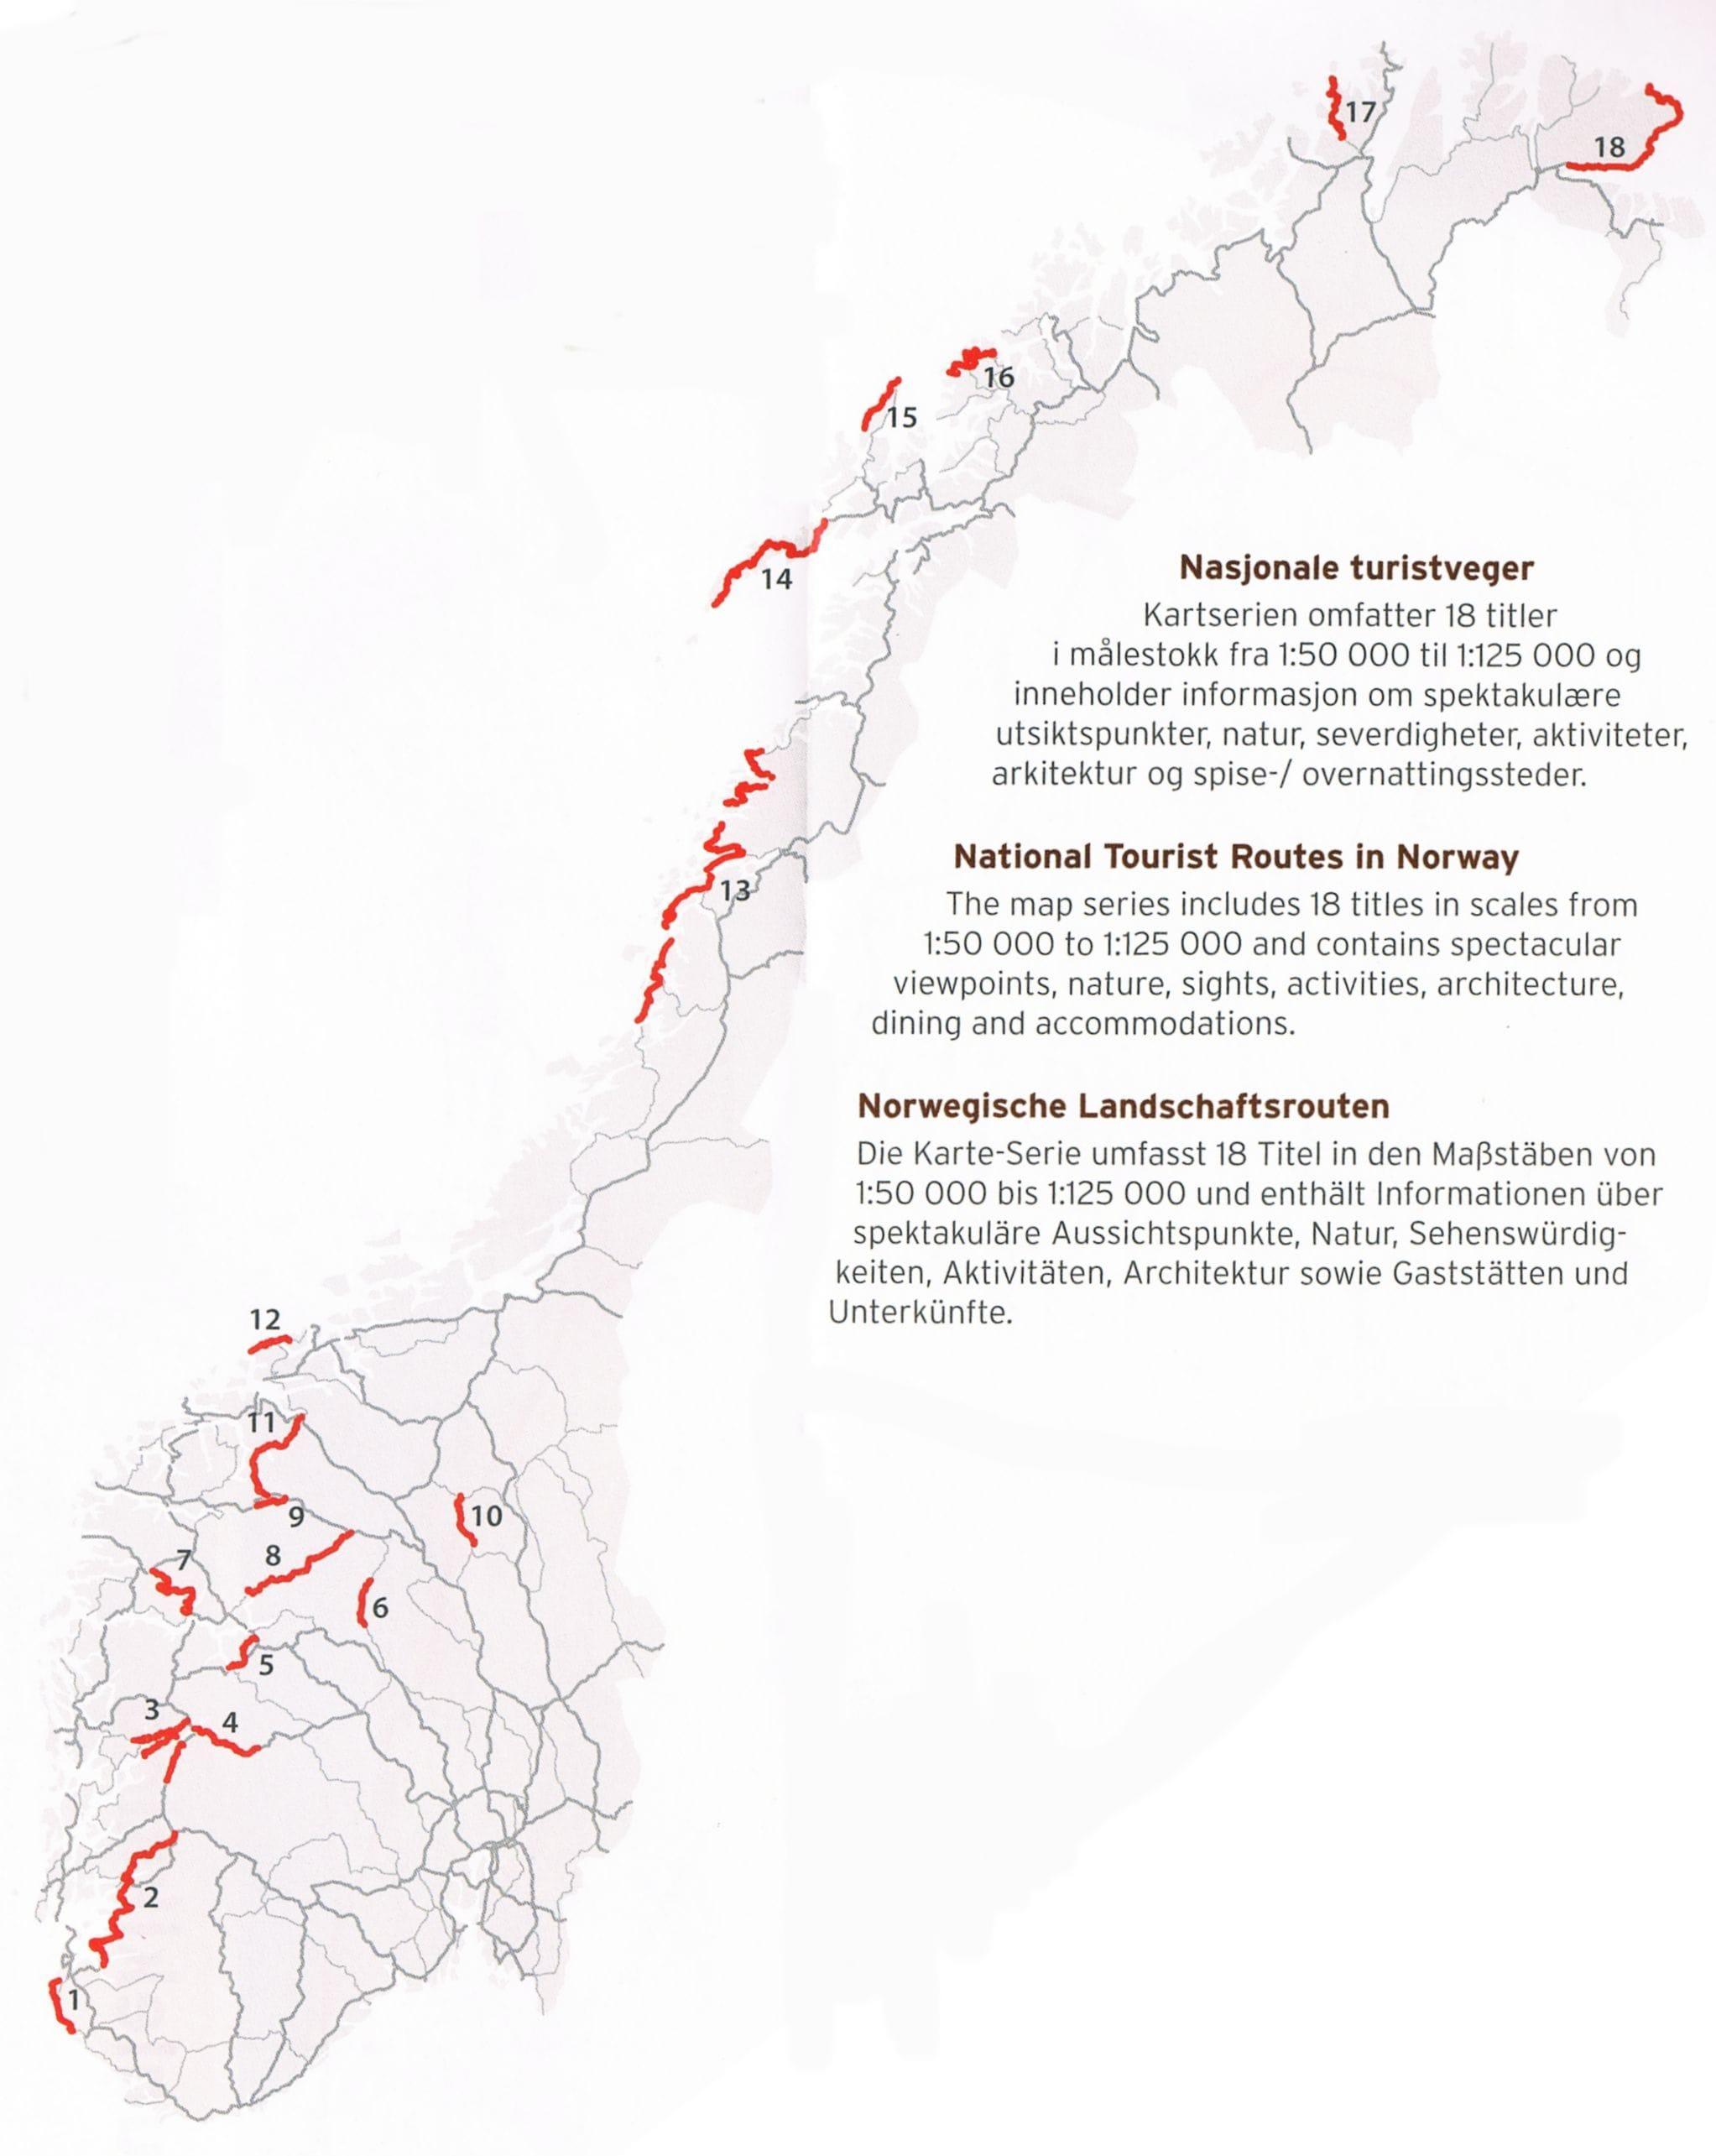 Buy Maps UK France Spain Ireland World Maps Worldwide - Norway road map pdf